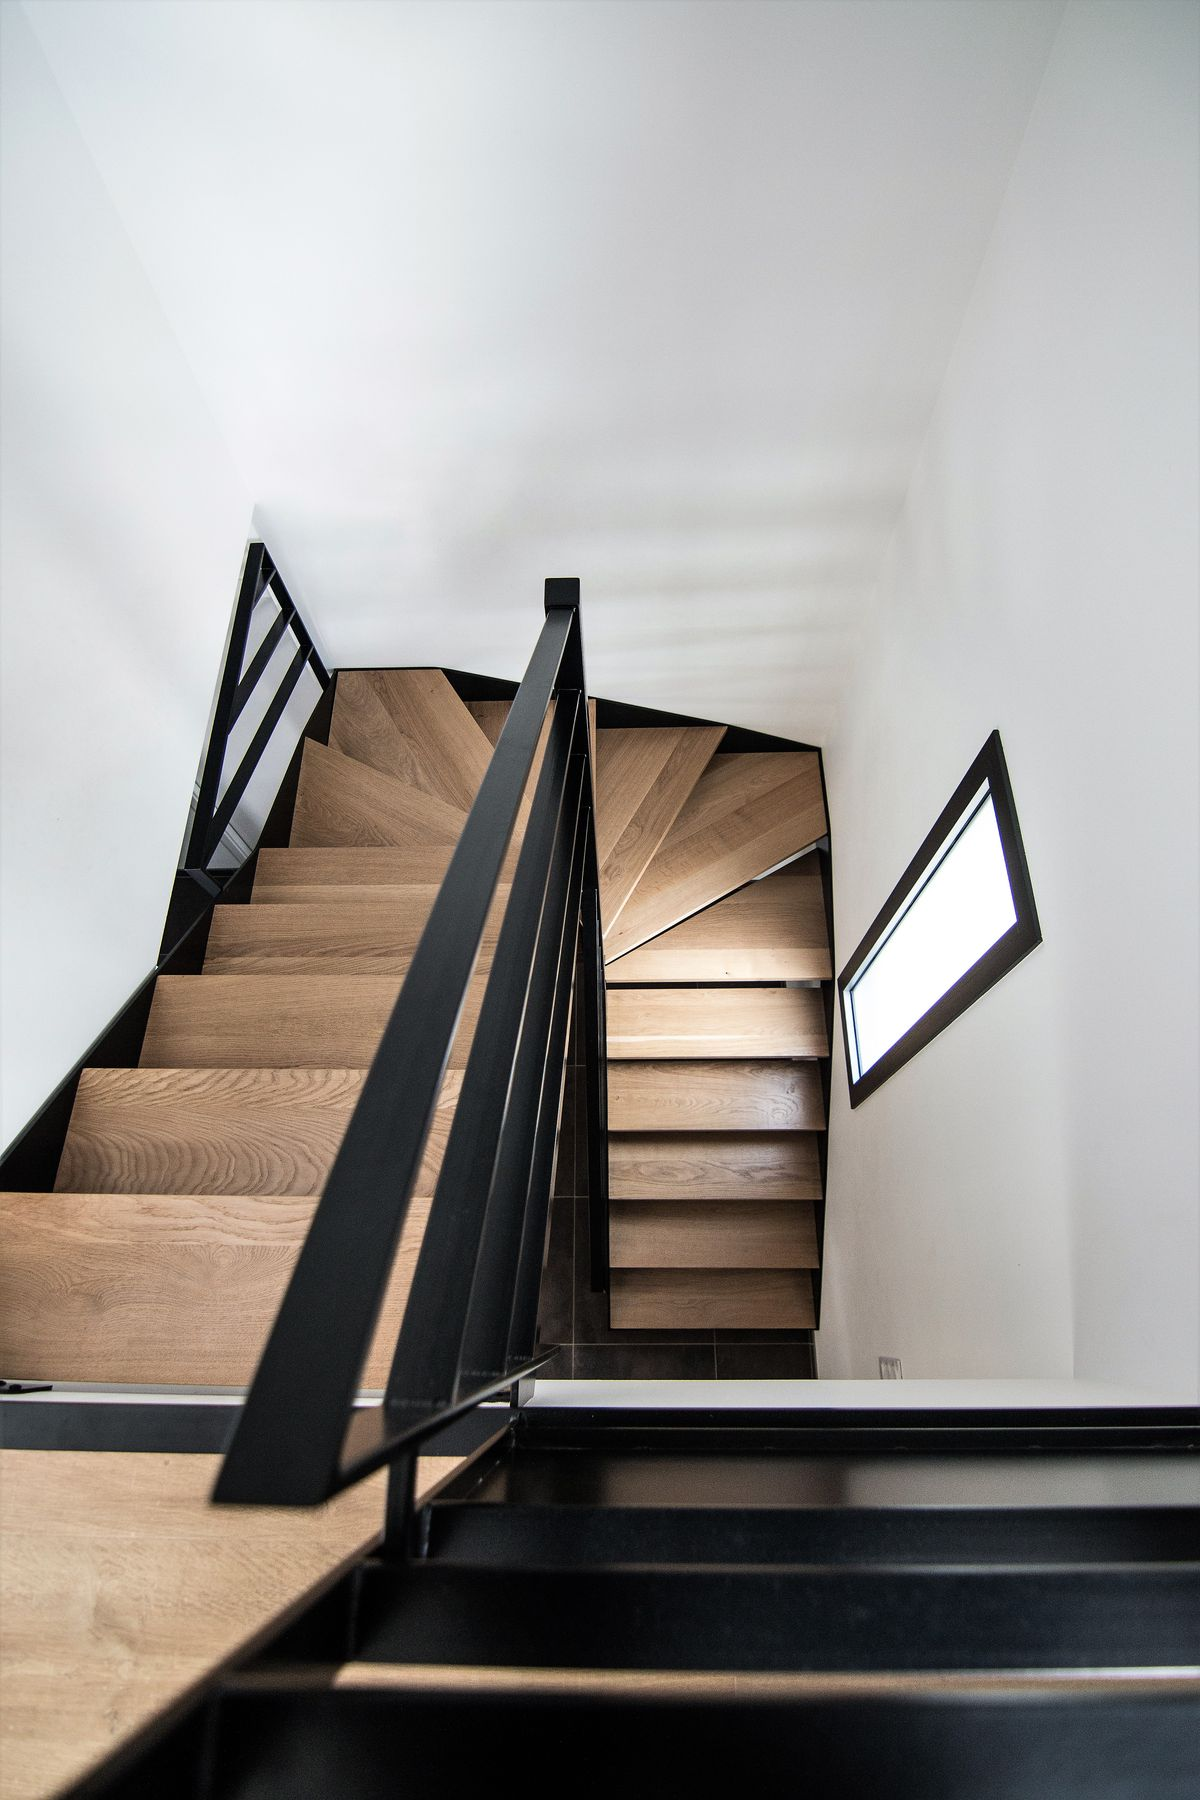 Escalier Bois Metal Noir escalier bois metal laque noir-metallerie-martin